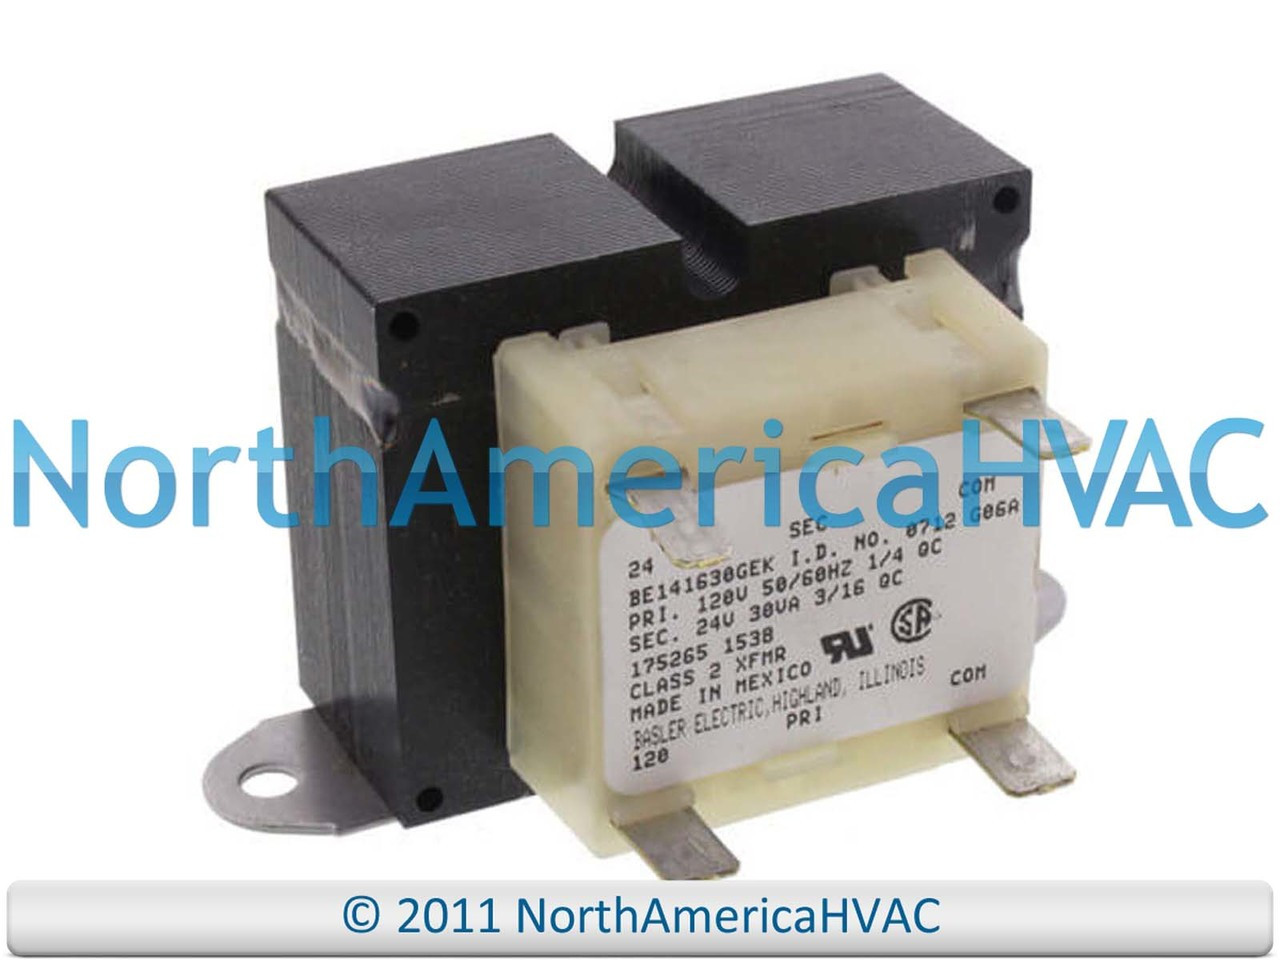 OEM Reznor Control Transformer 30va 120v to 24v 175265 RZ175265 BE141630GEK  - North America HVACNorth America HVAC